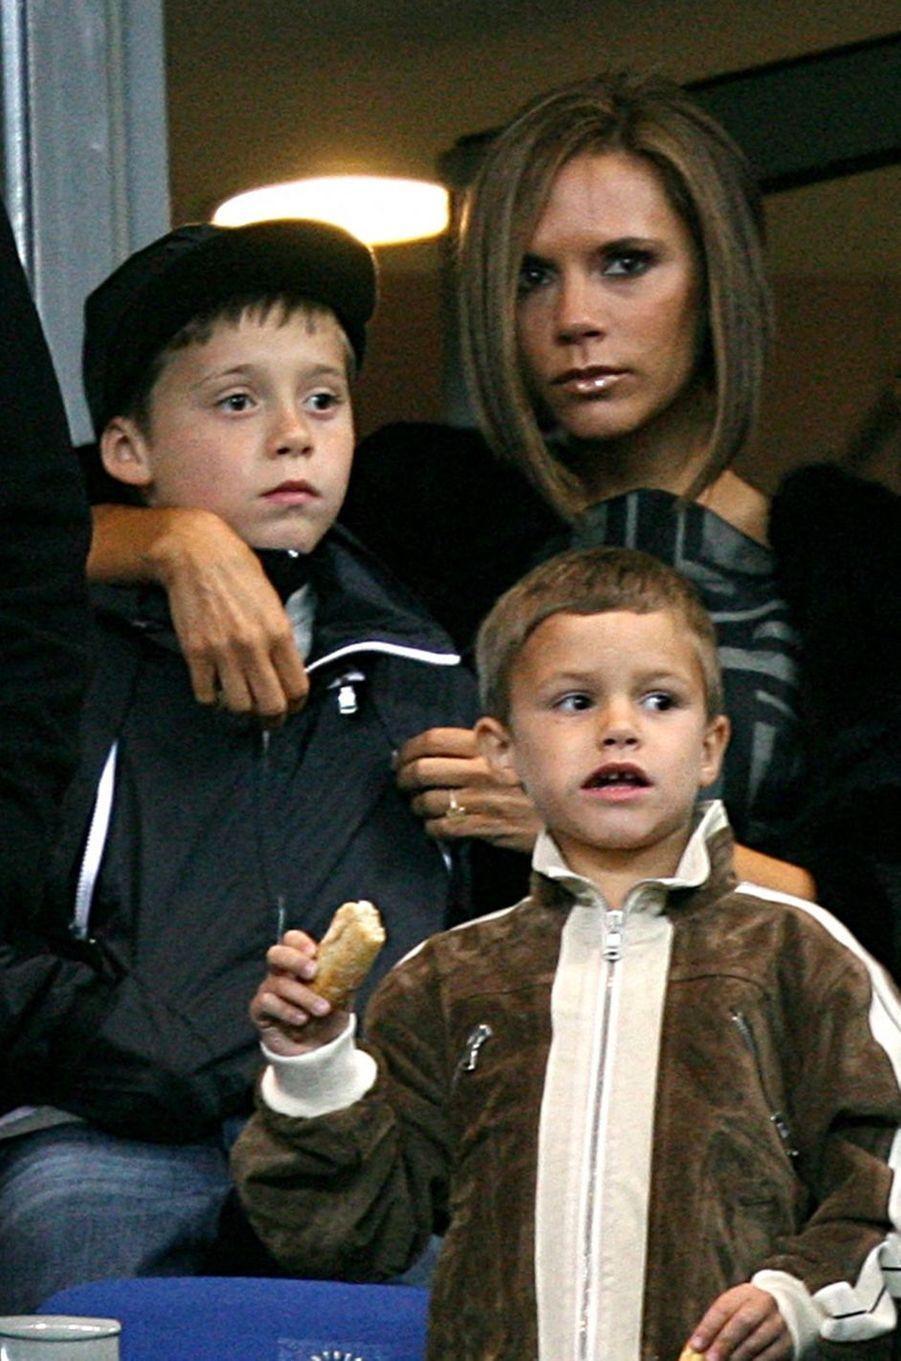 Brooklyn et Romeo Beckham avec leur mère Victoria Beckham en mars 2008